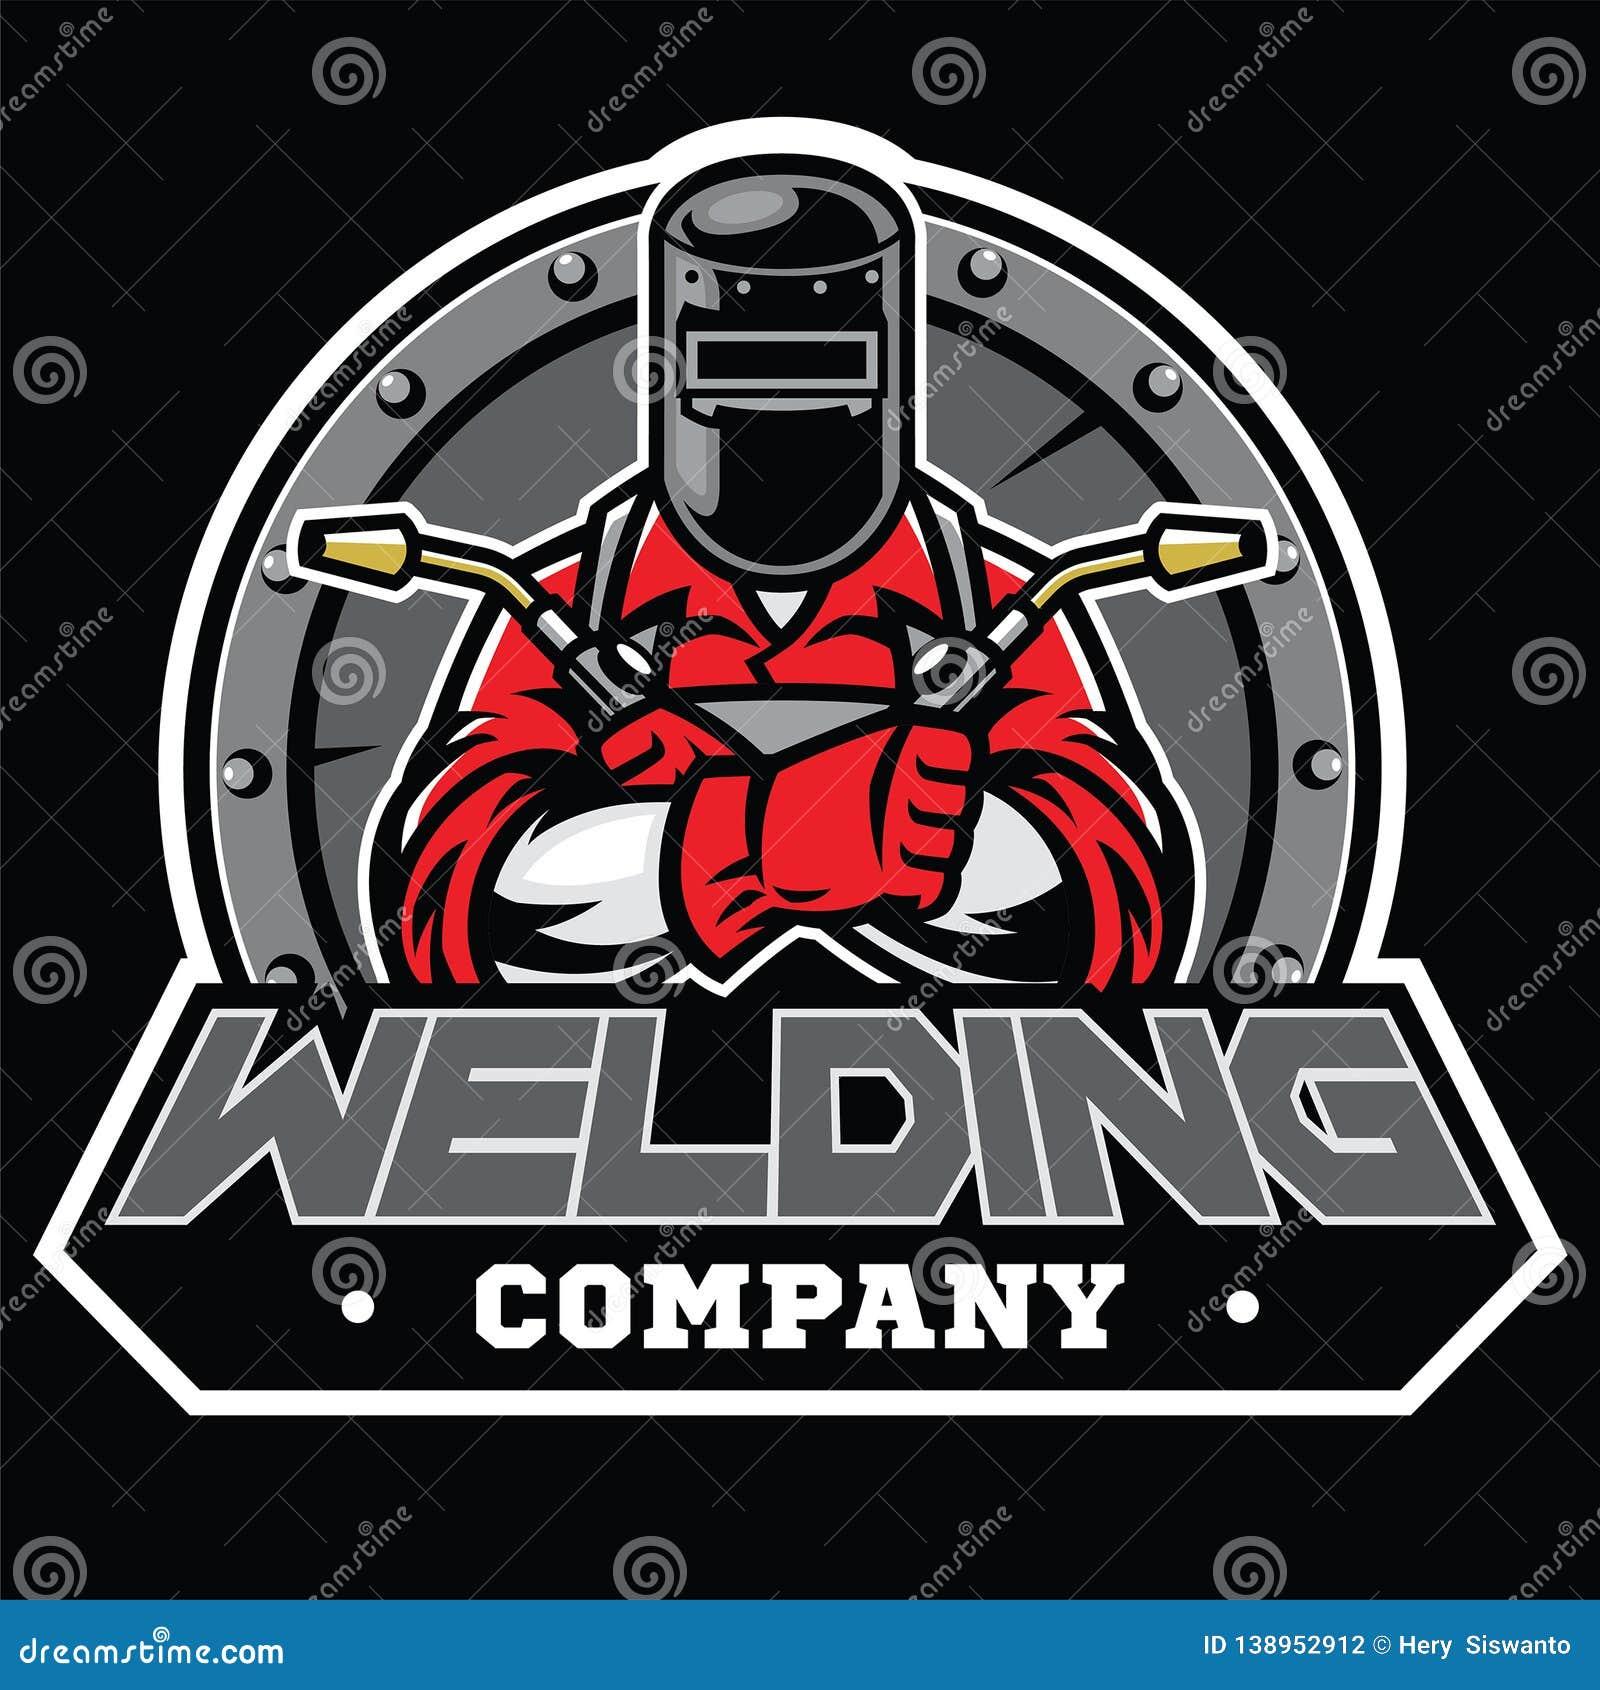 Welding Stock Illustrations 11 402 Welding Stock Illustrations Vectors Clipart Dreamstime